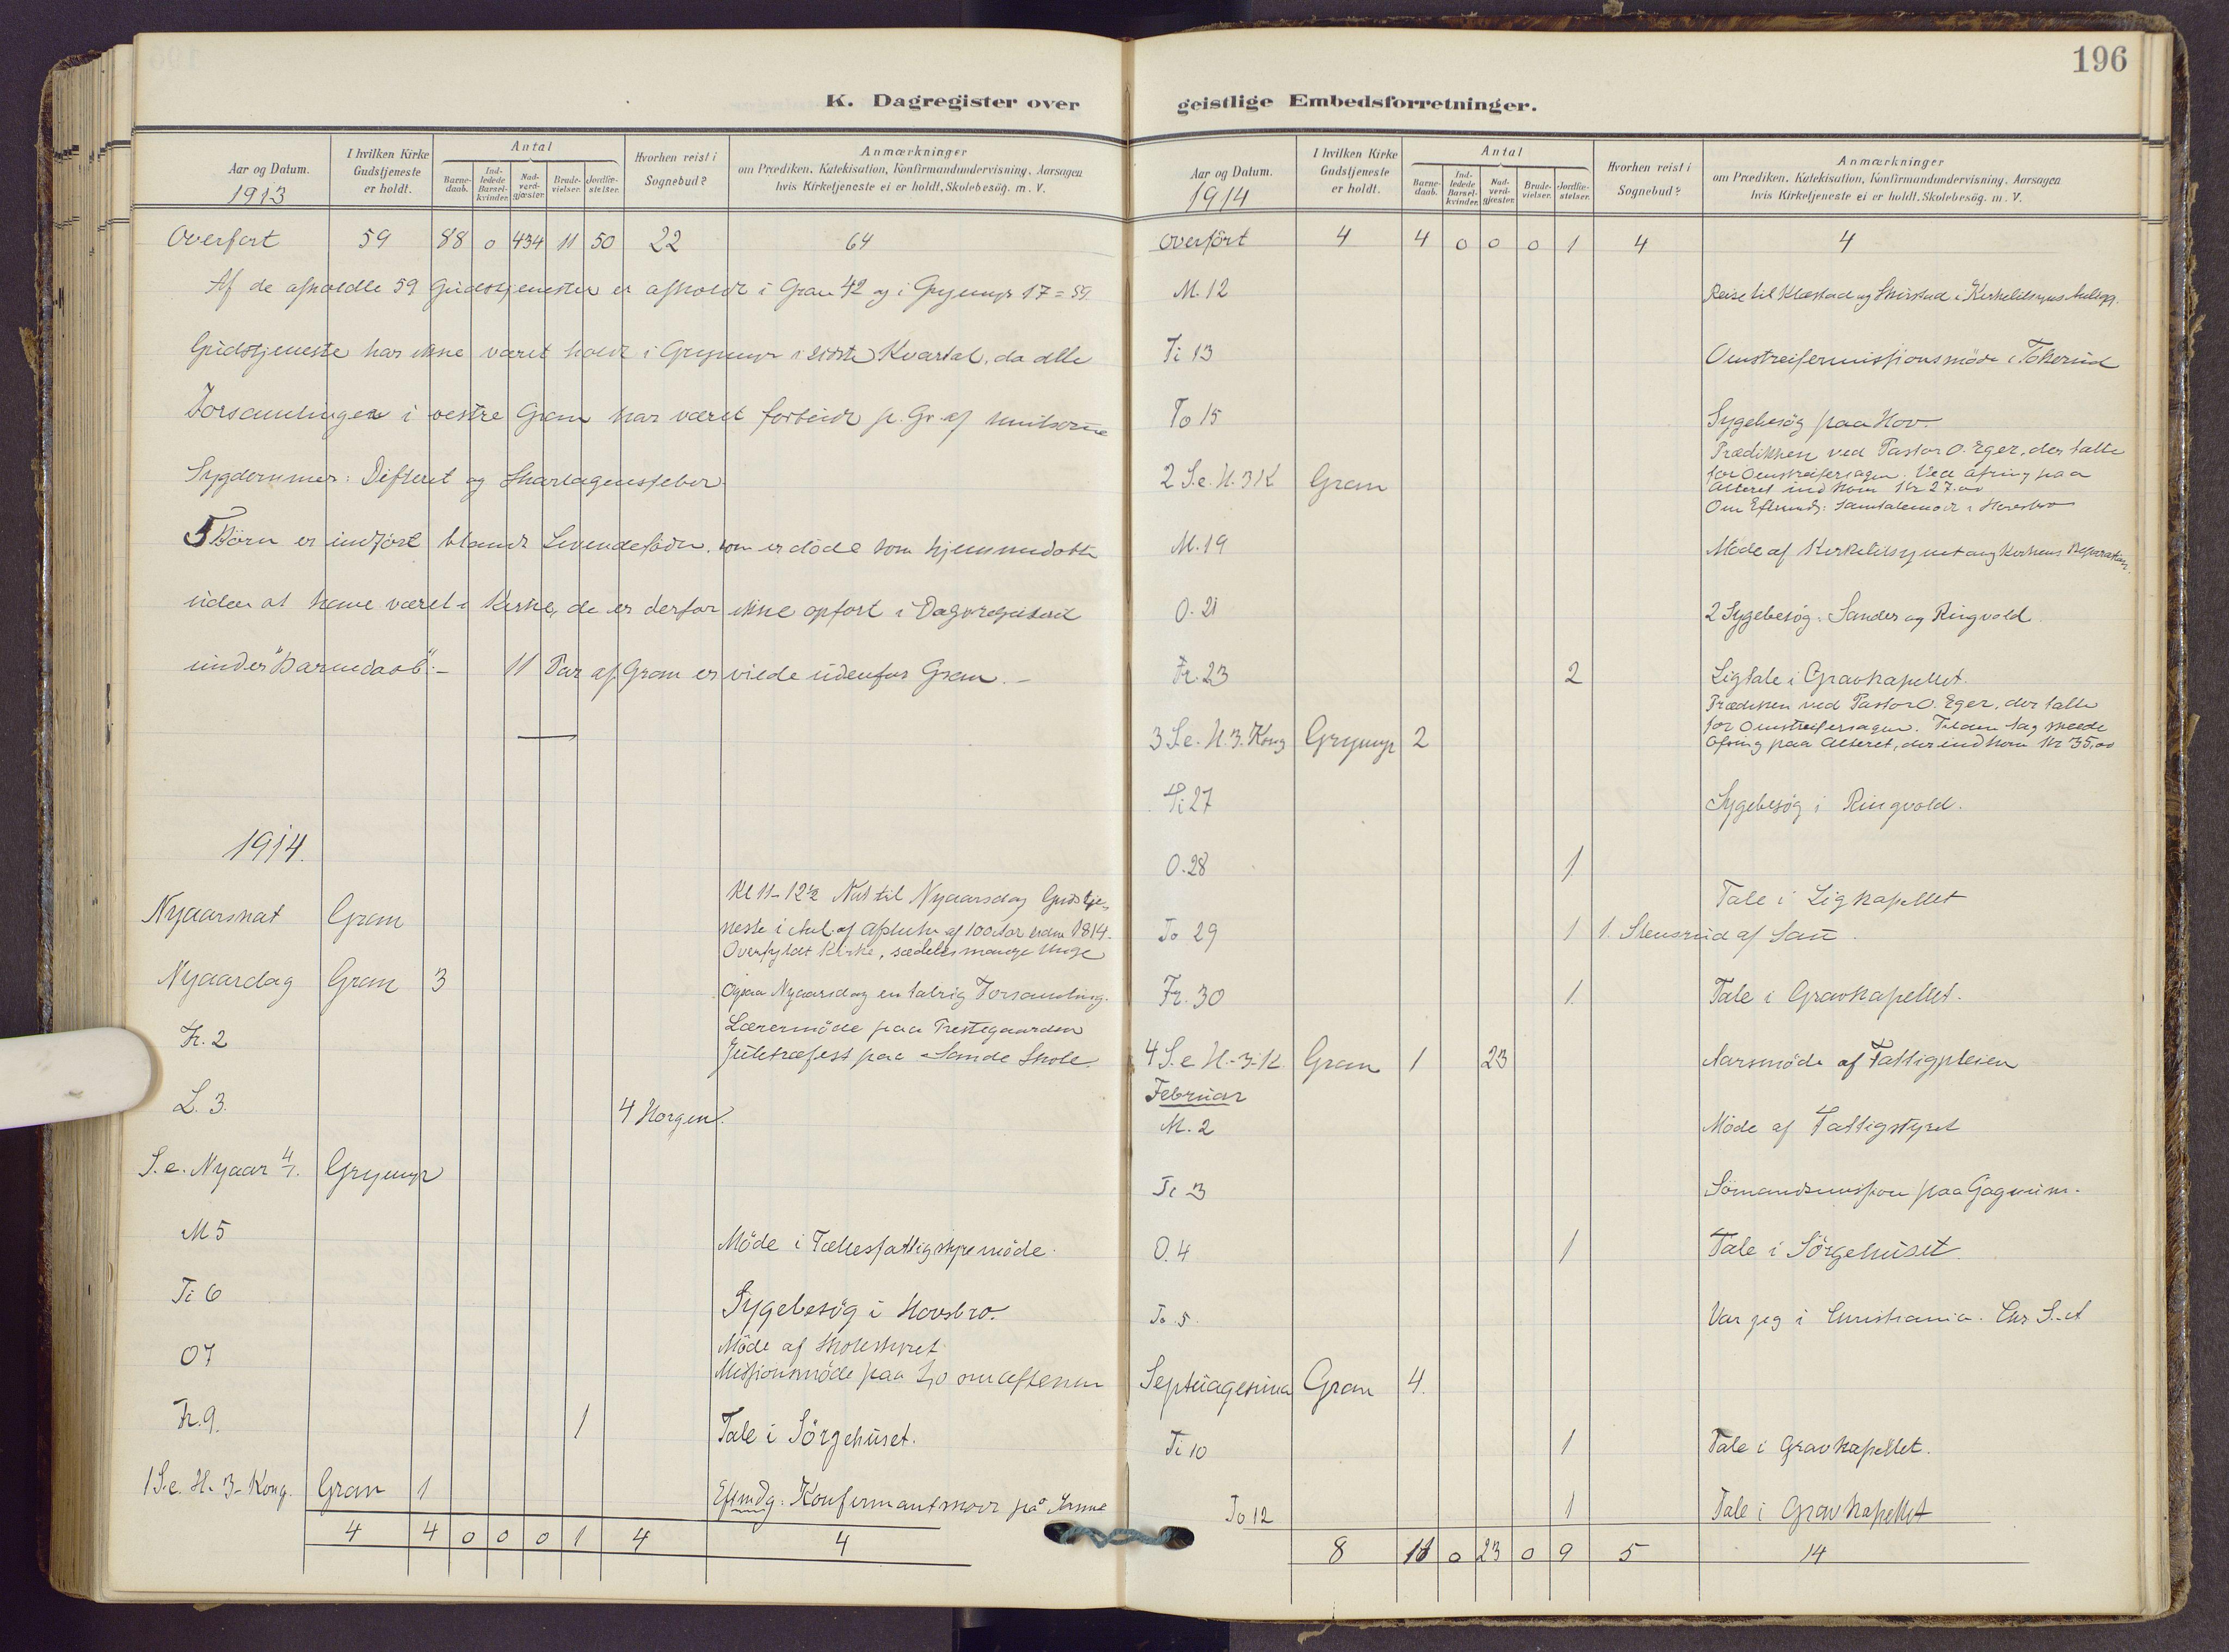 SAH, Gran prestekontor, Ministerialbok nr. 22, 1908-1918, s. 196